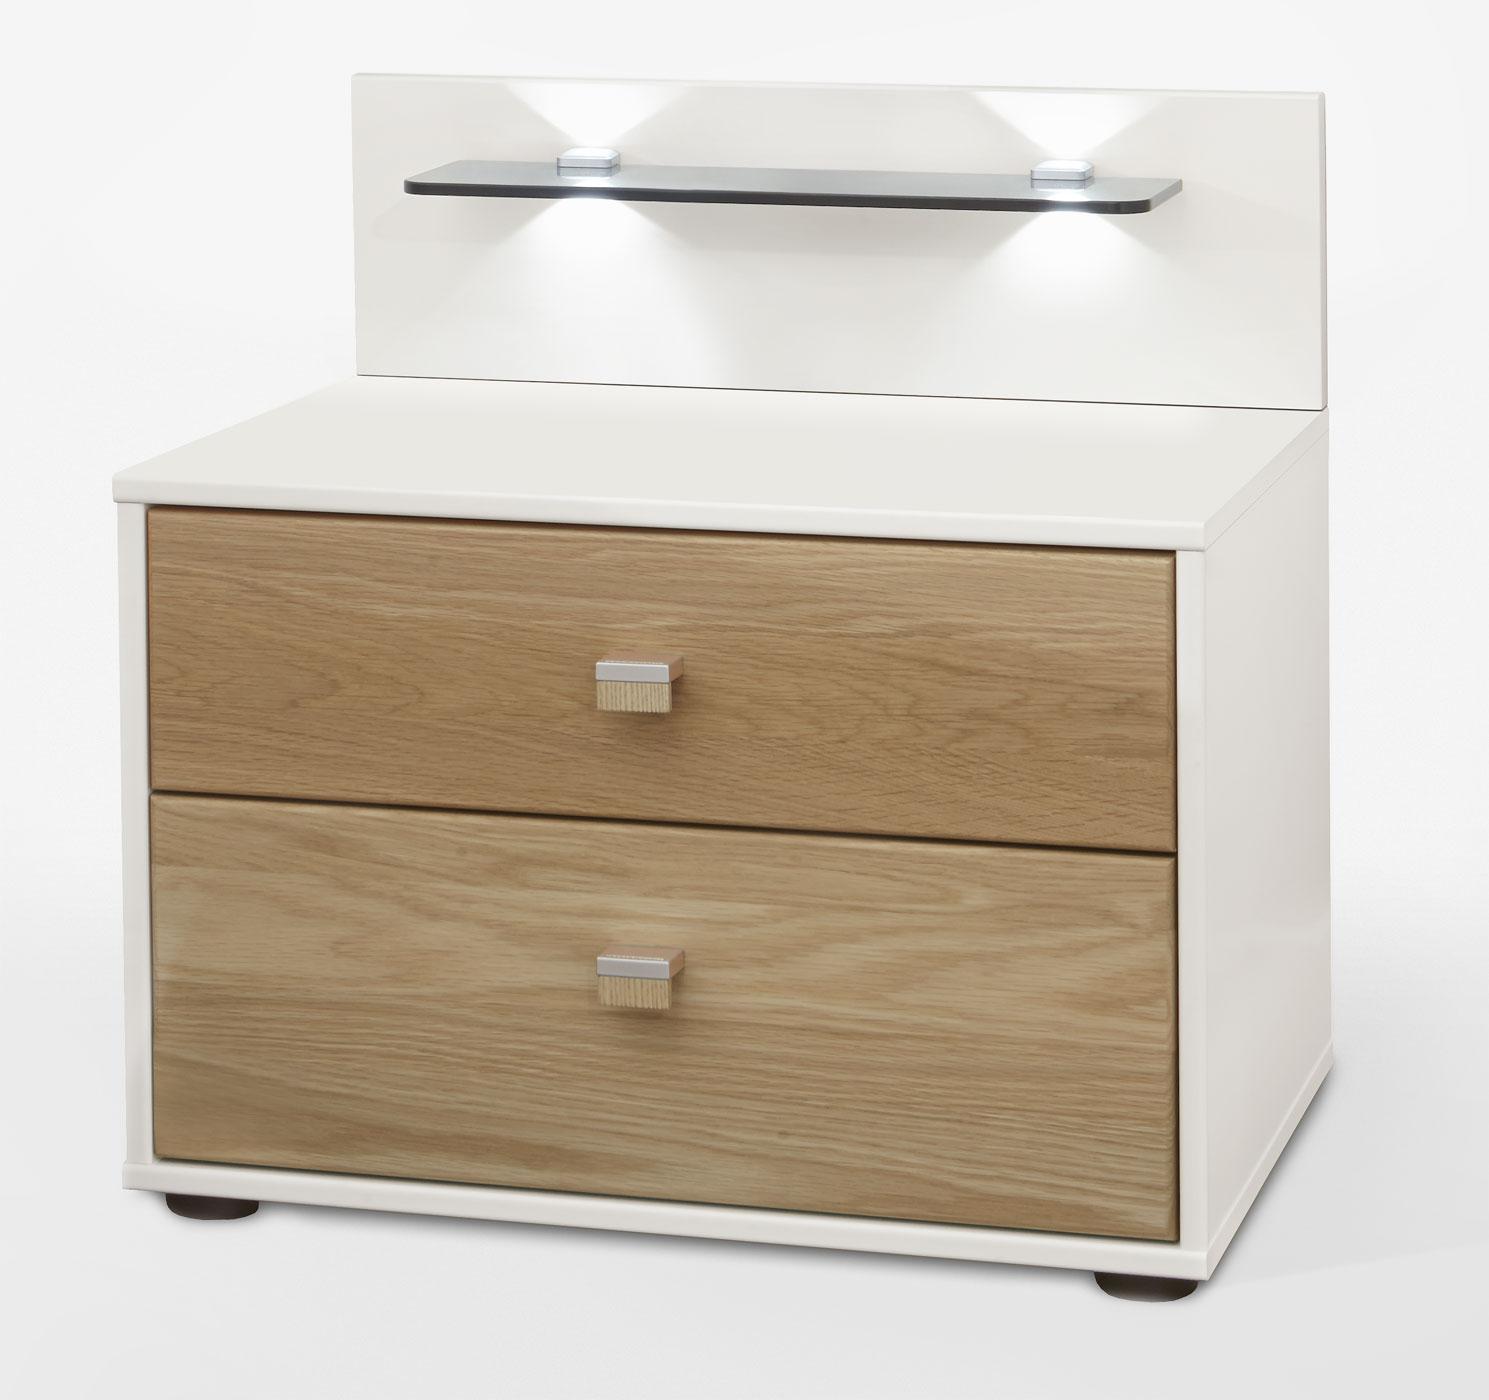 nachttisch mit led beleuchtung top nachttisch nuncia x weiss led beleuchtung steppnaht with. Black Bedroom Furniture Sets. Home Design Ideas